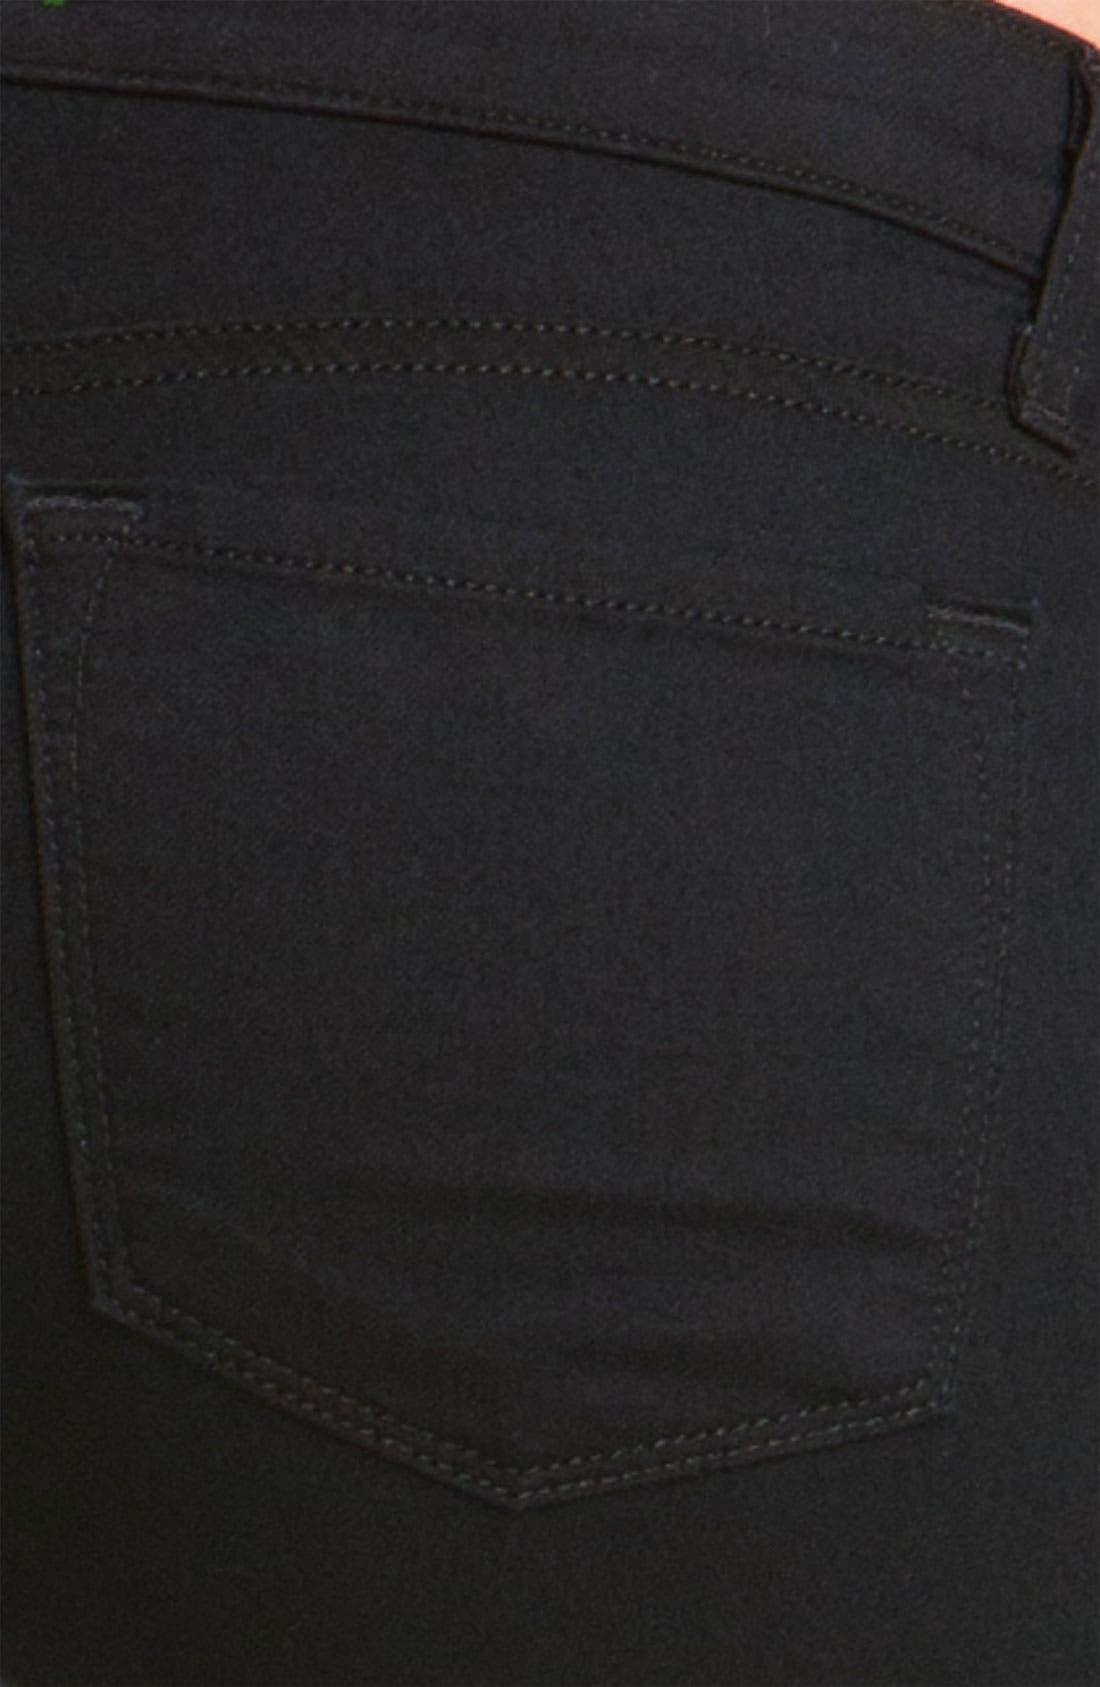 J BRAND,                             'Legging' Stretch Jeans,                             Alternate thumbnail 2, color,                             002